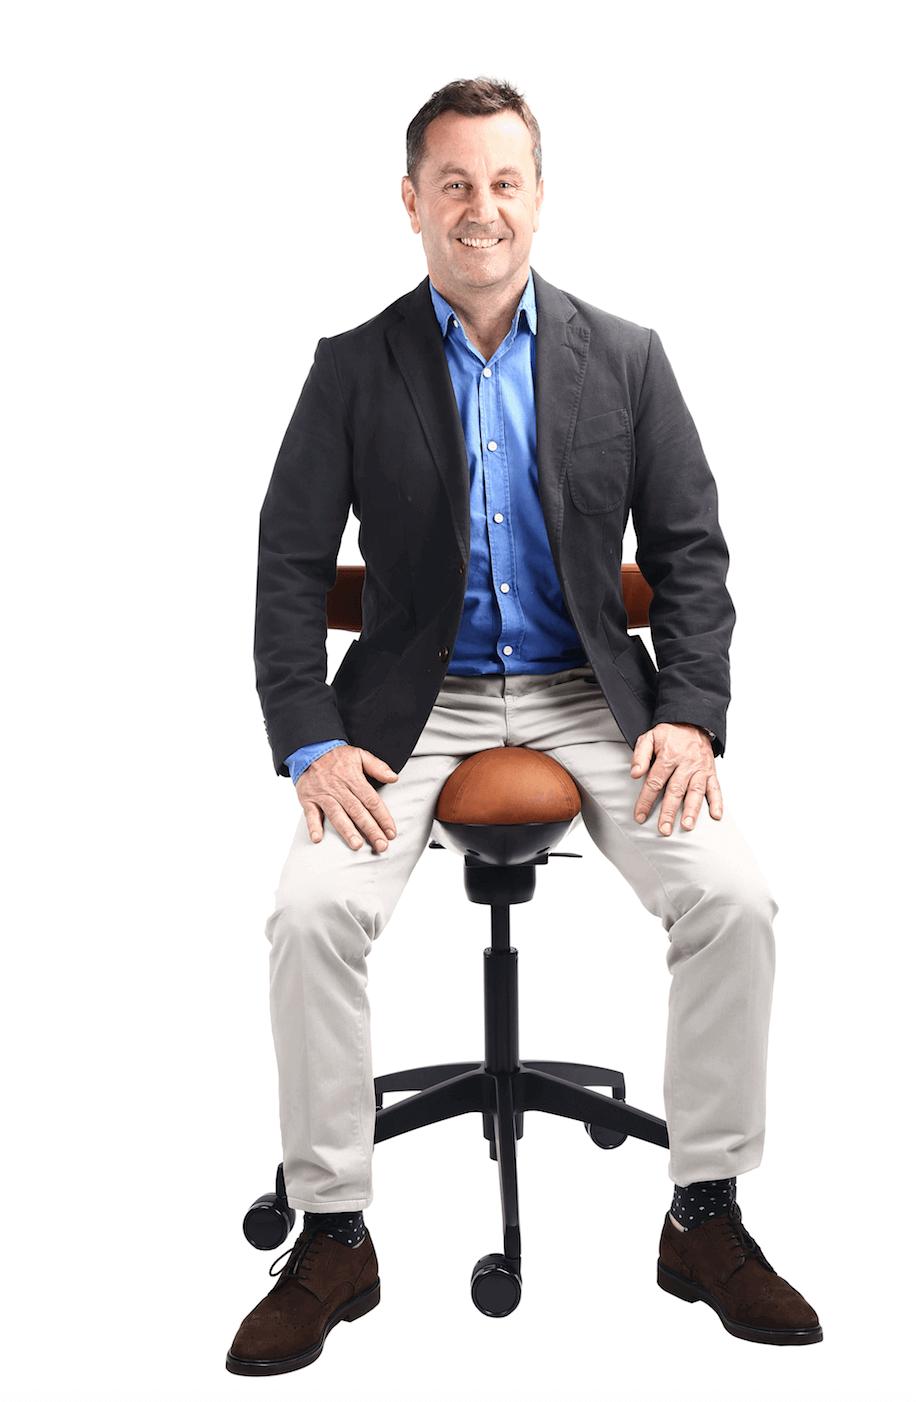 David France Chiropractor Displaying Correct Posture